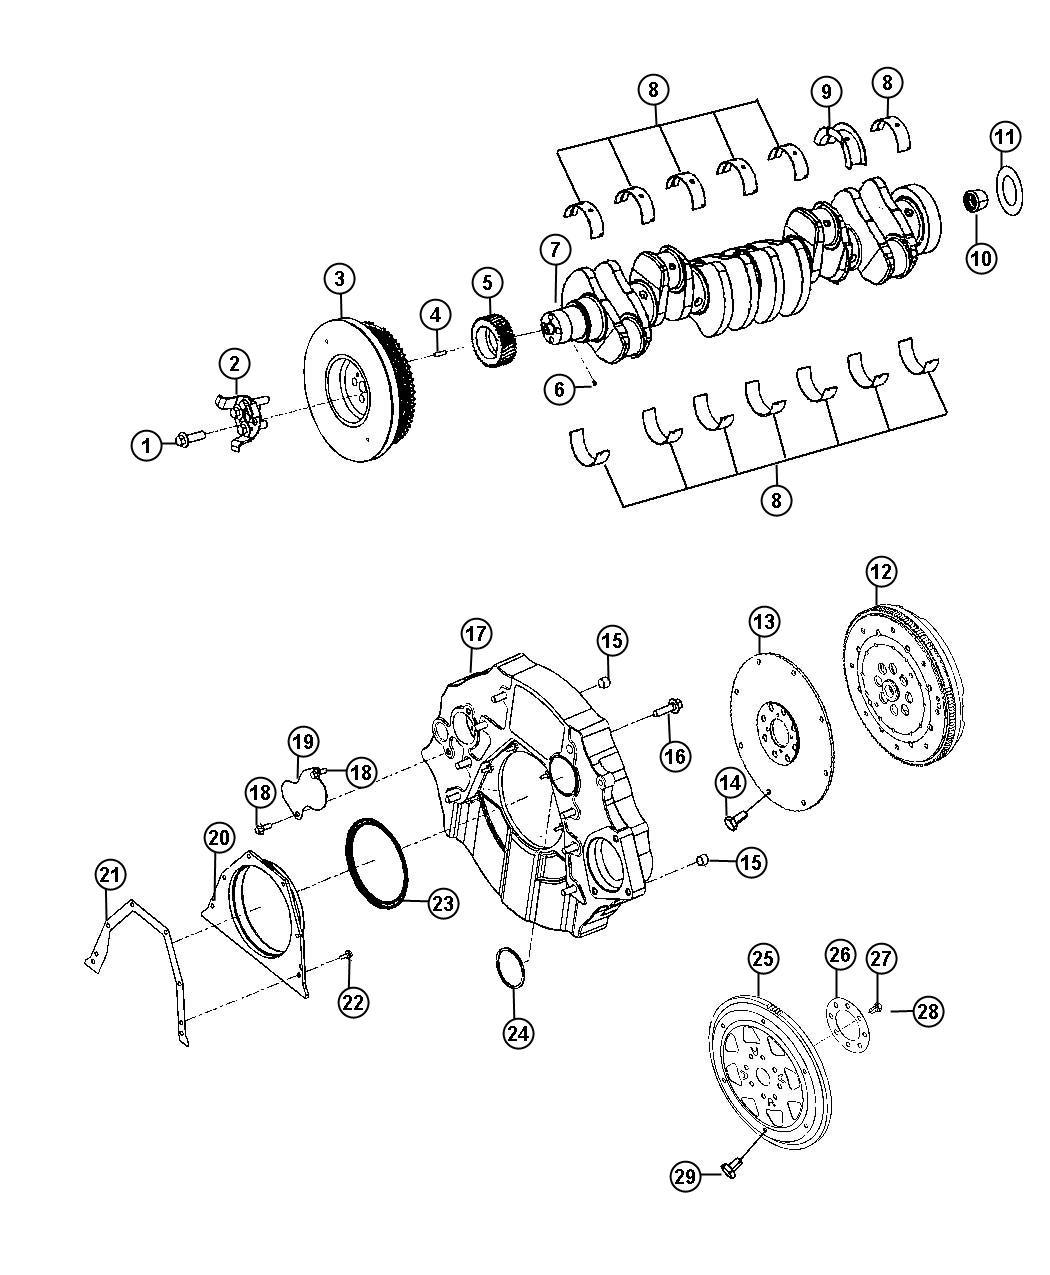 Ram 4500 Adapter. Transmission. Automatic transmission